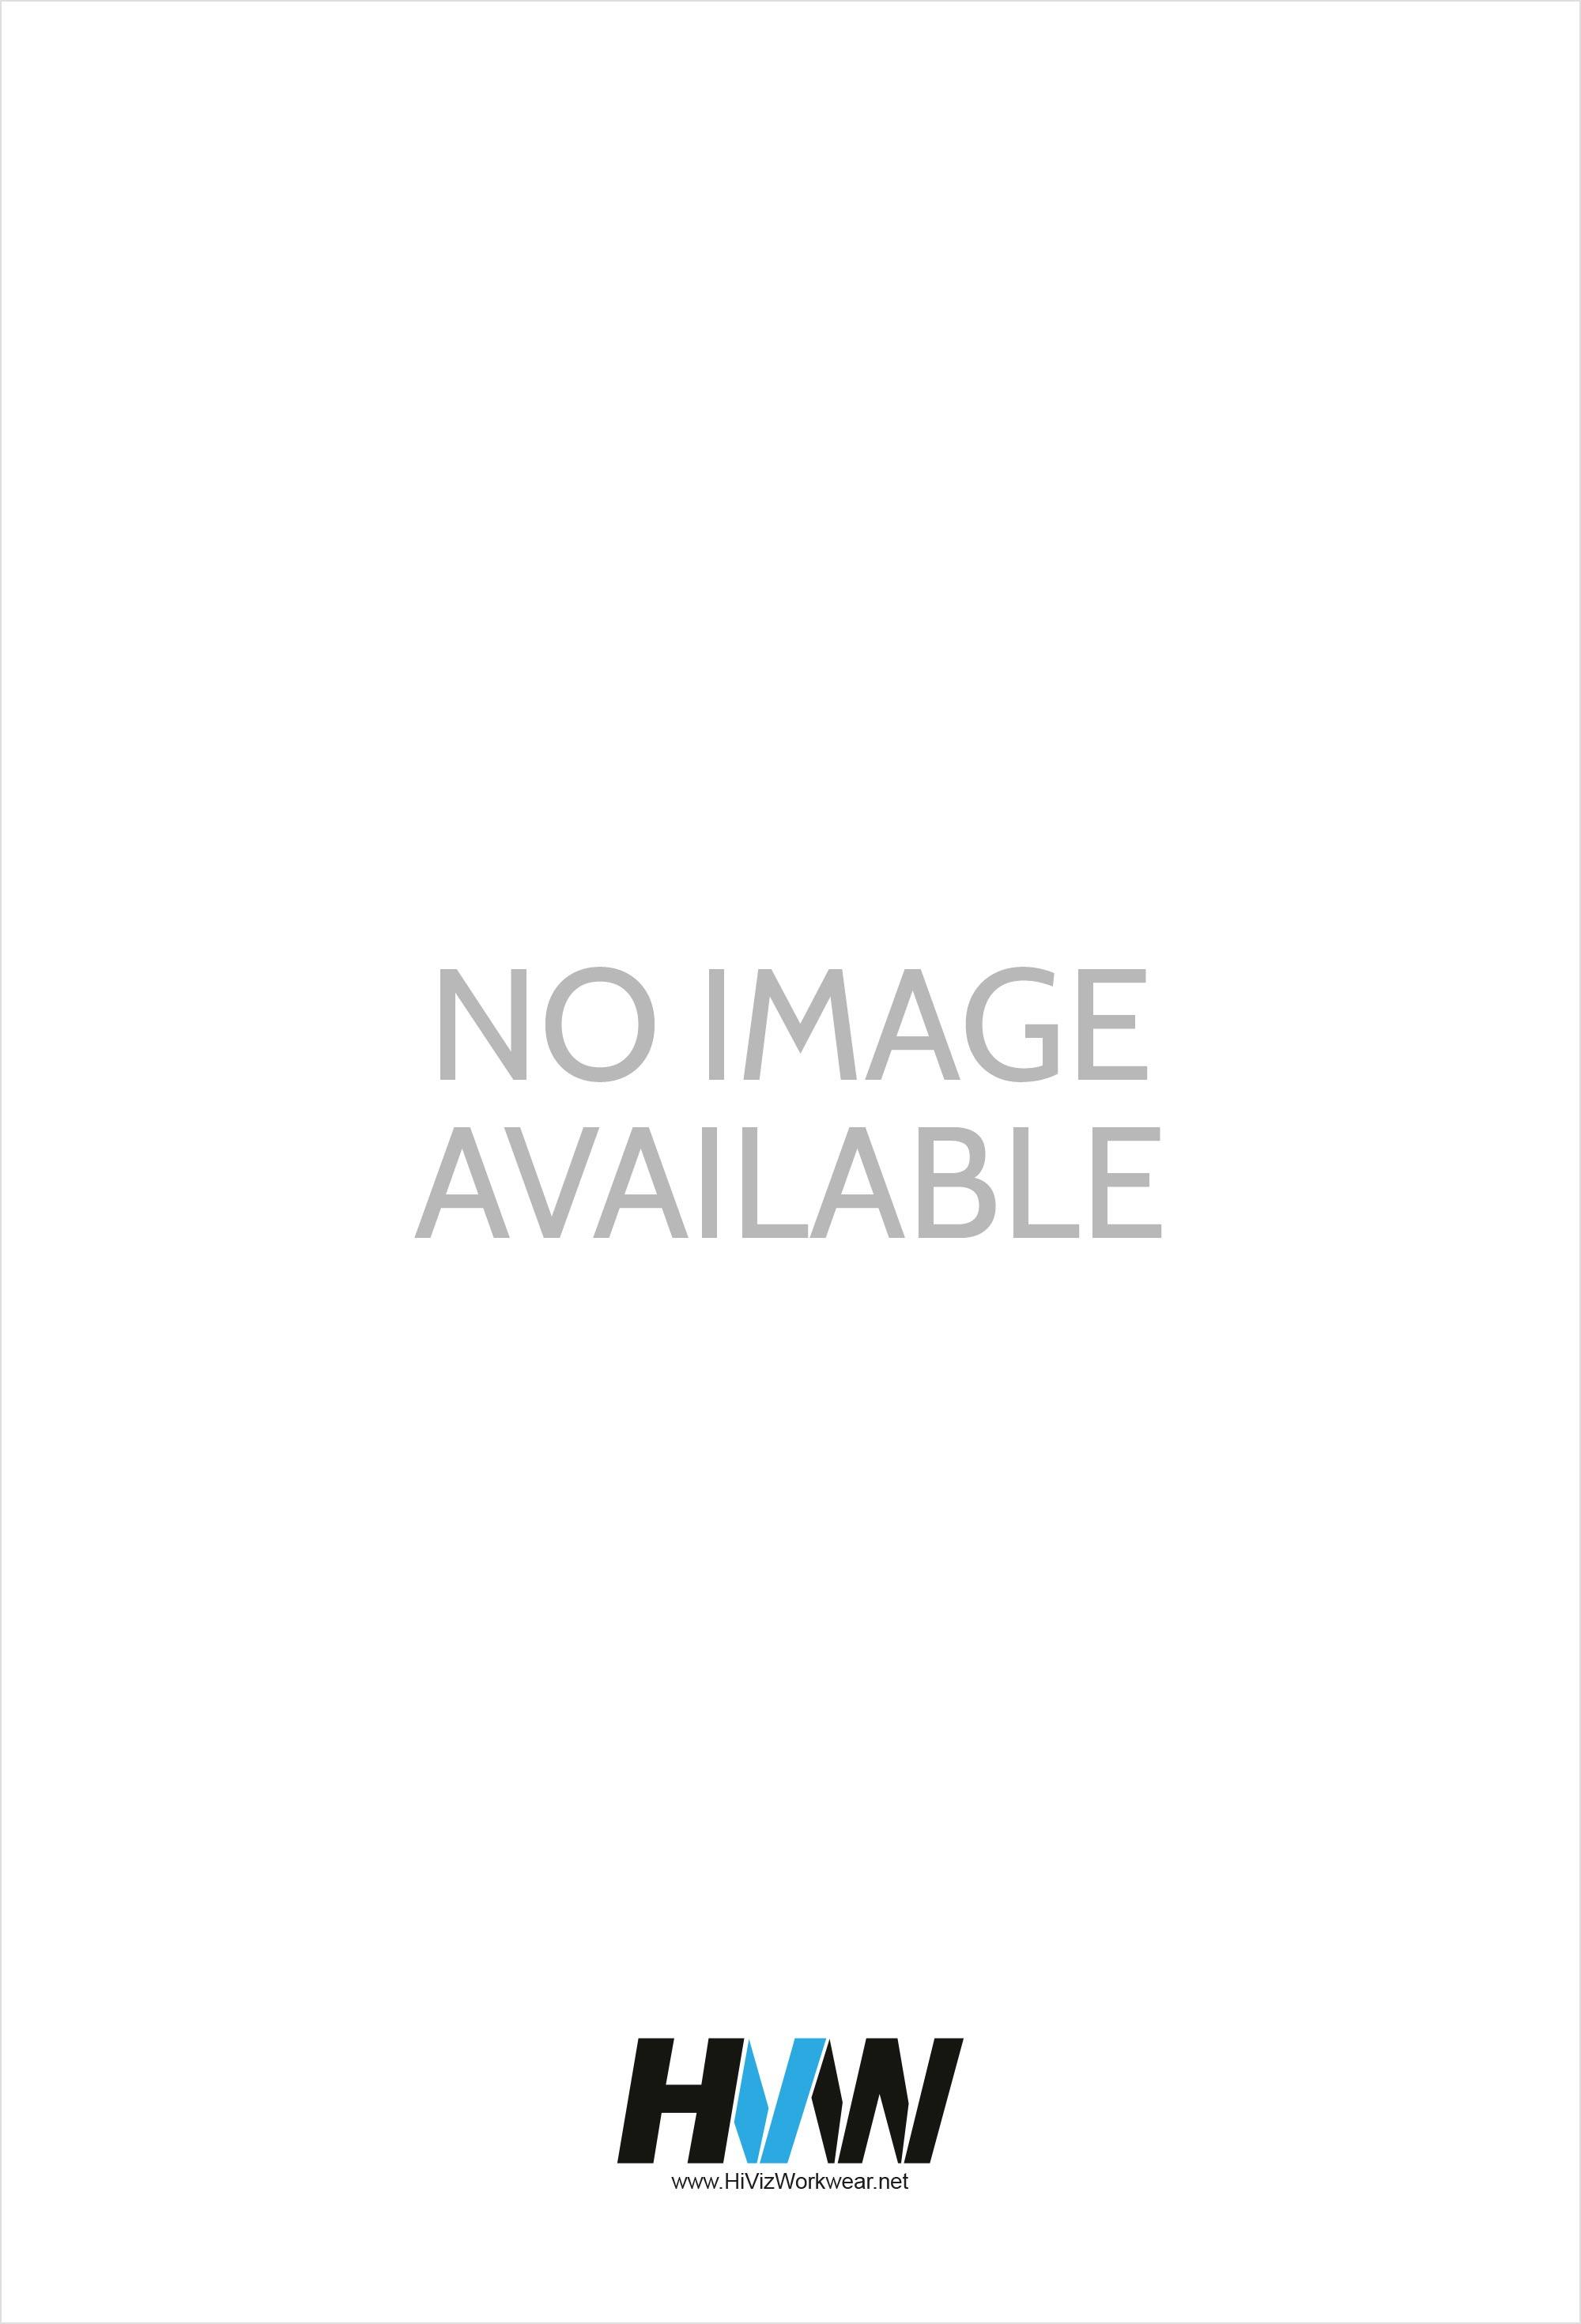 KK350 WorkWear Oxford Short Sleeved Shirt (Collar Size 14.5 To 18.5)